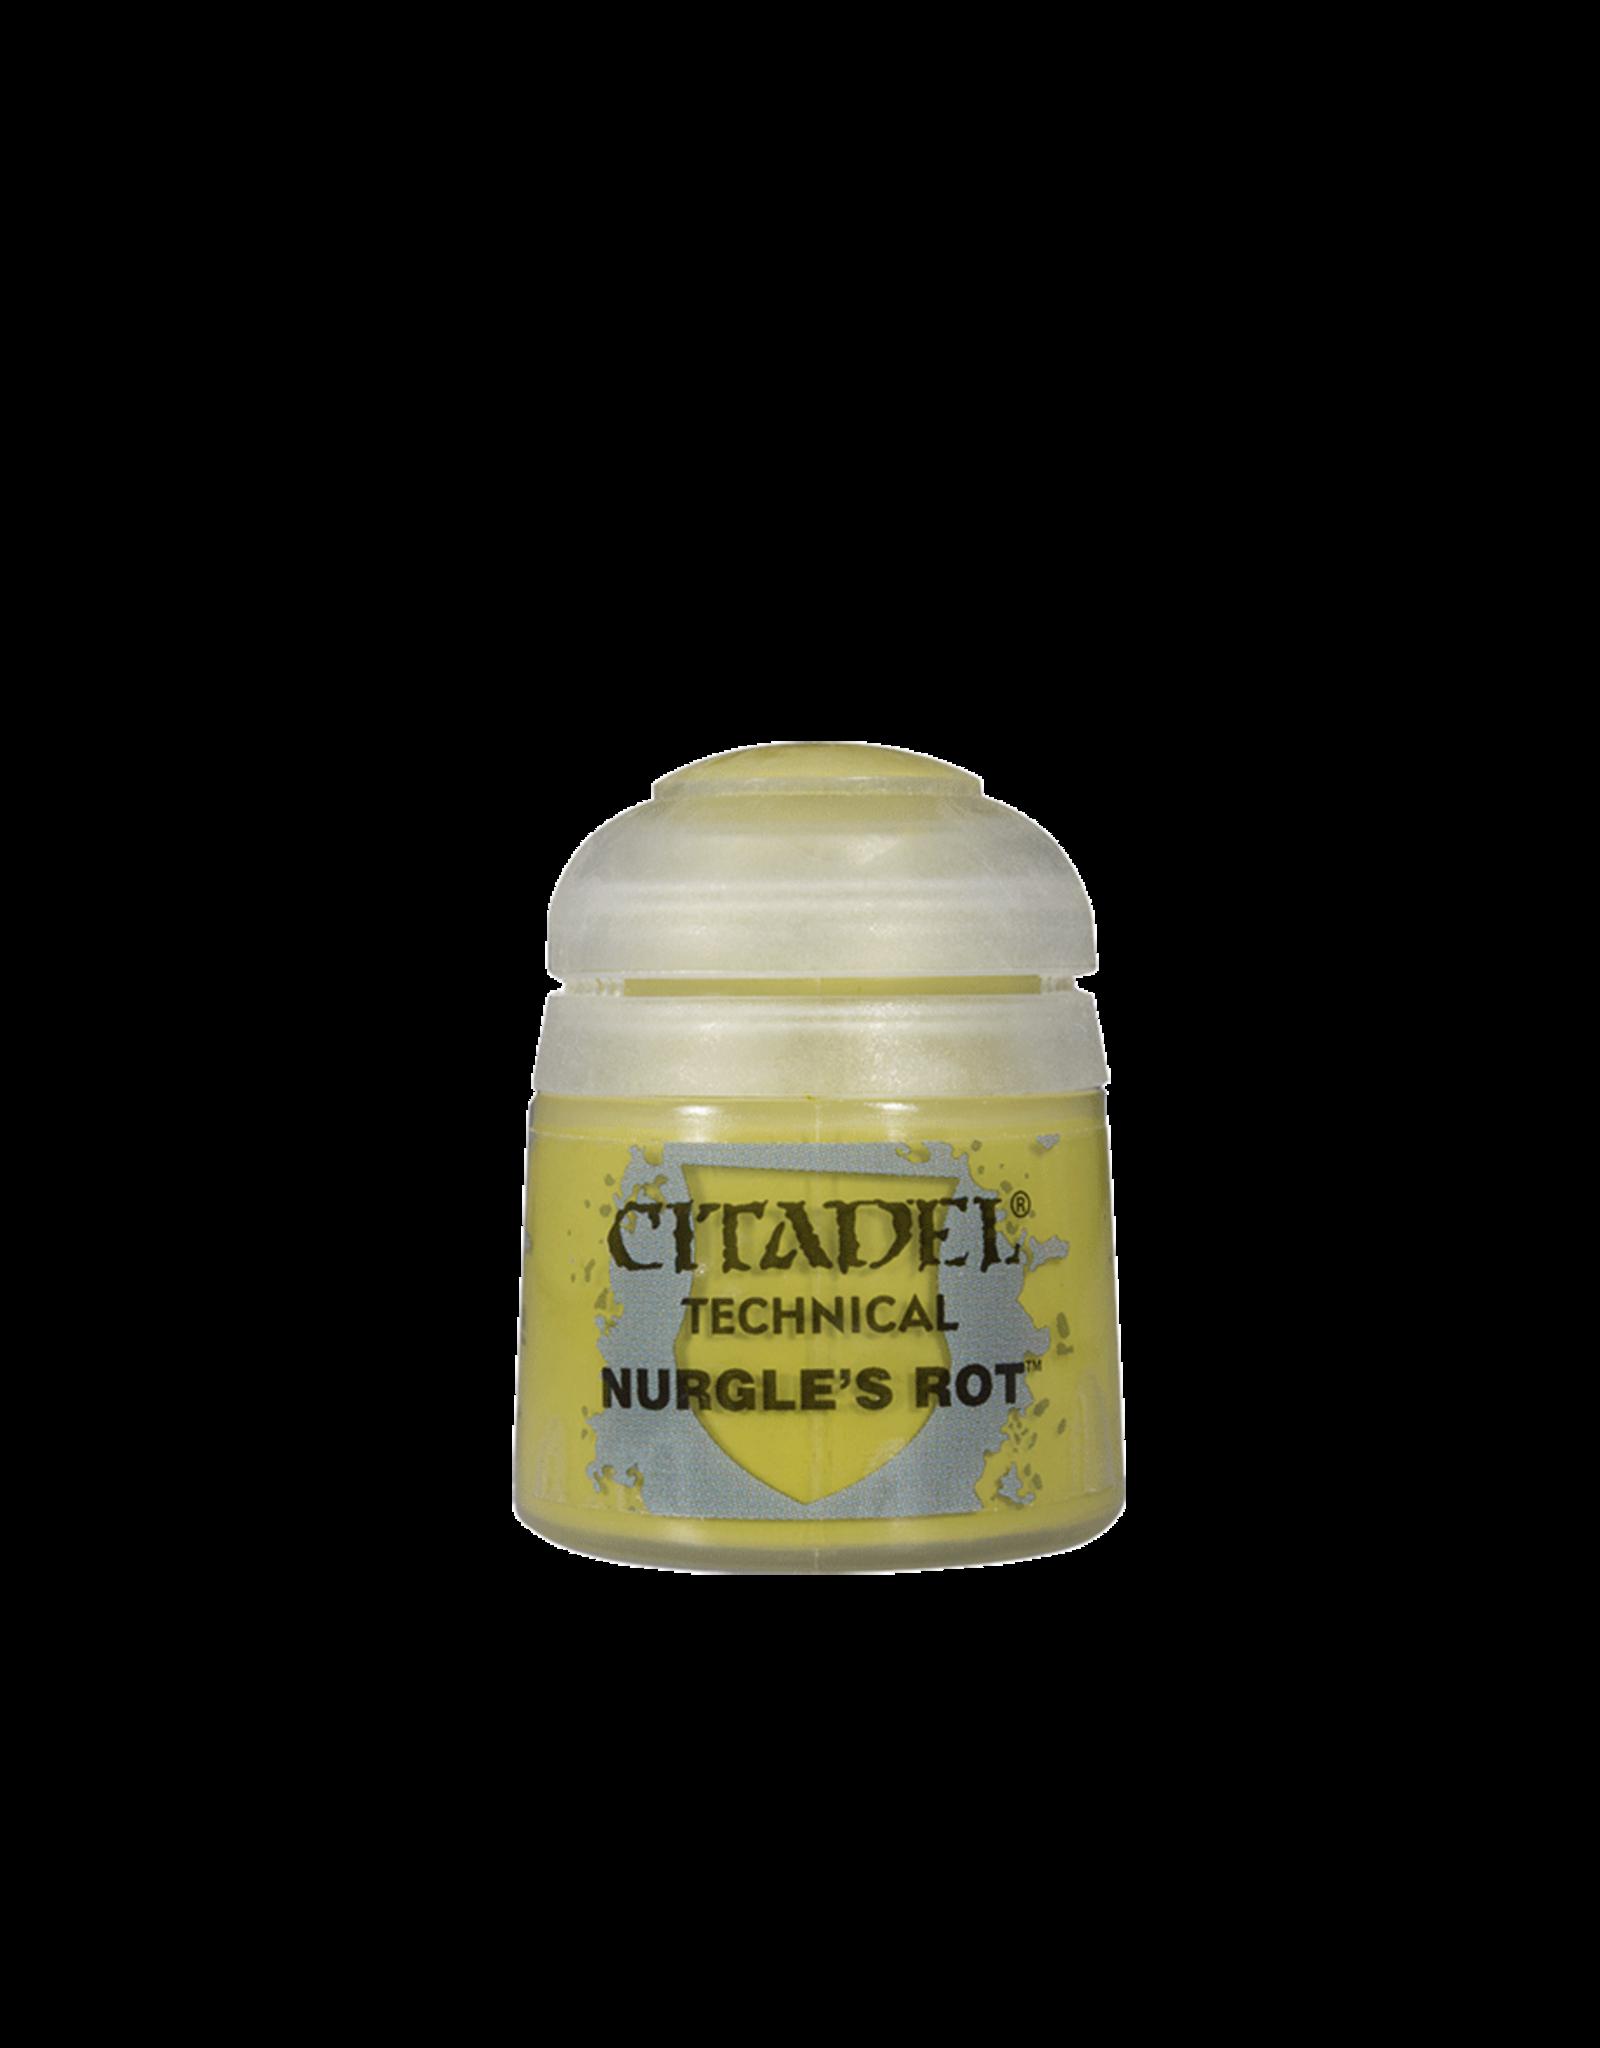 Citadel Citadel Paints: Technical -  Nurgle's Rot